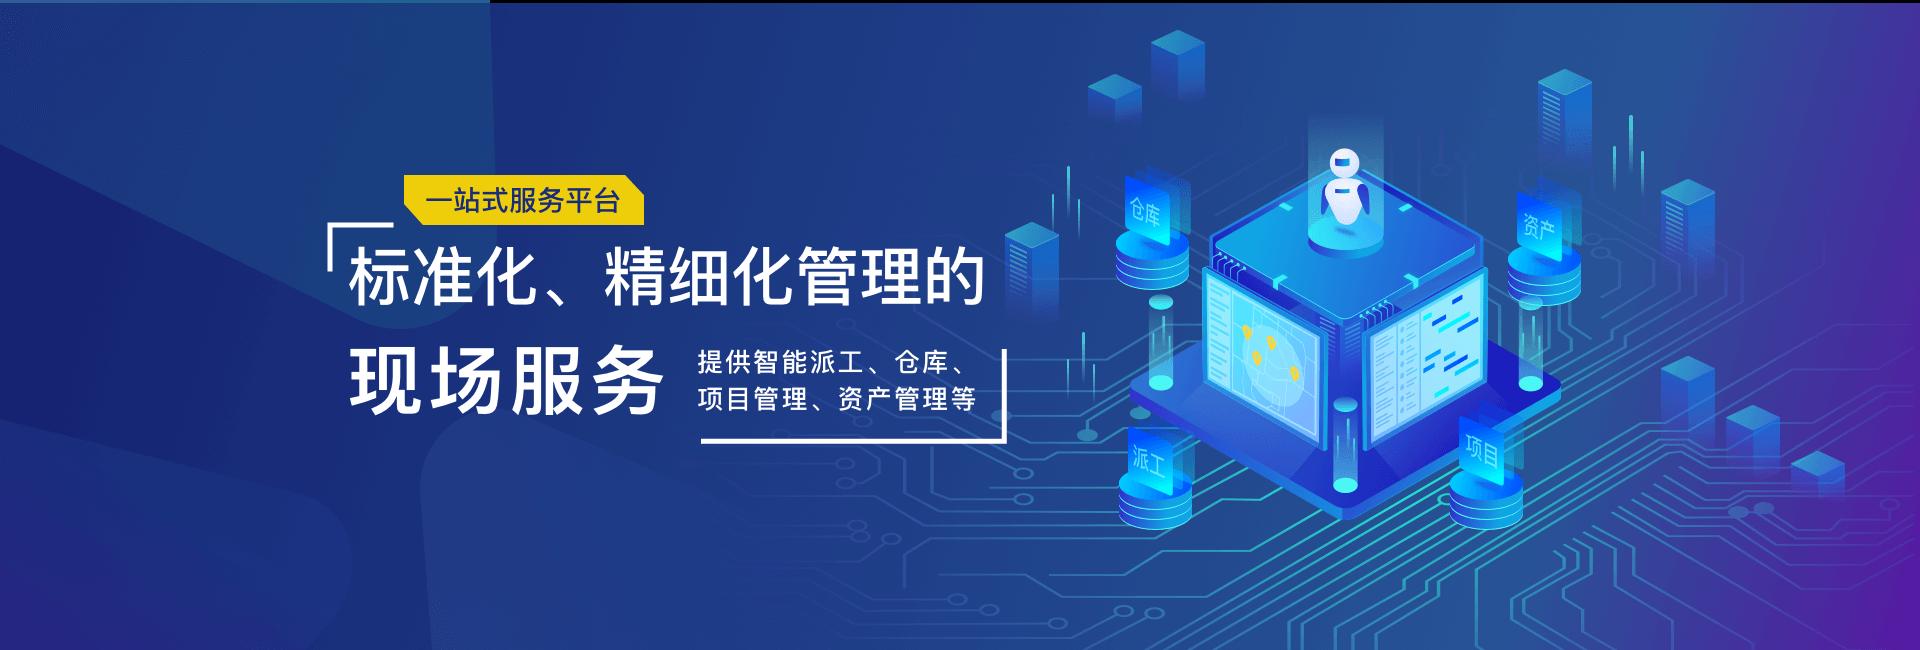 xcy banner-web